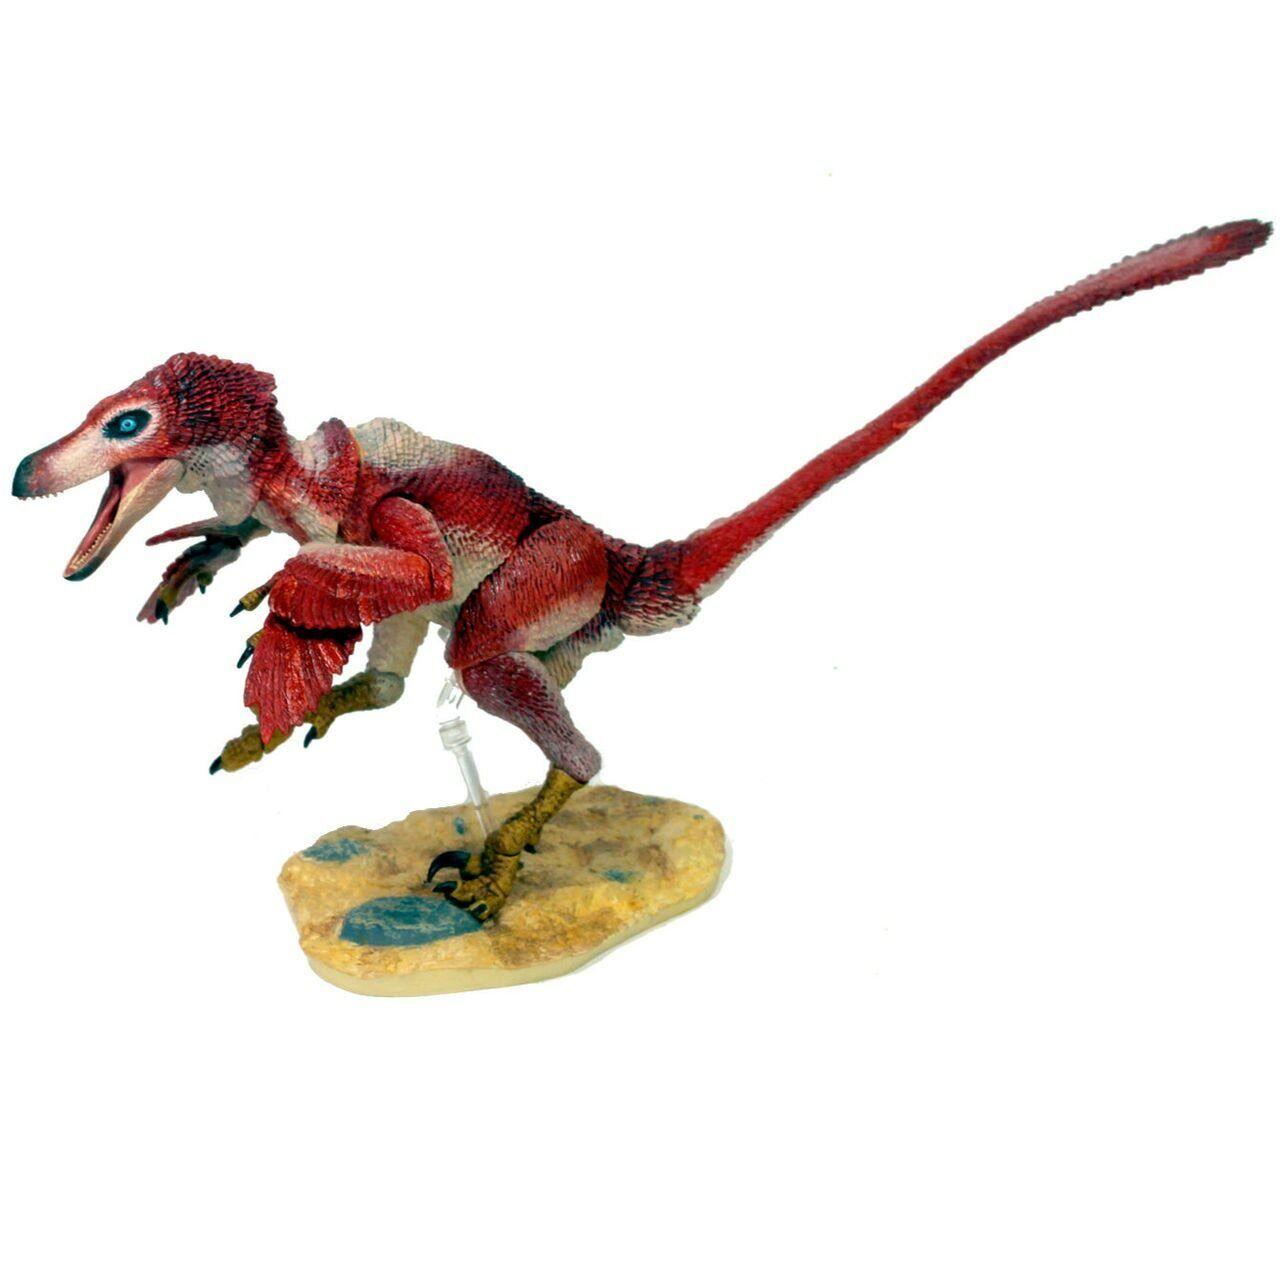 Beasts of the Mesozoic Velociraptor Osmolskae rosso 1 6 Scale Figurine